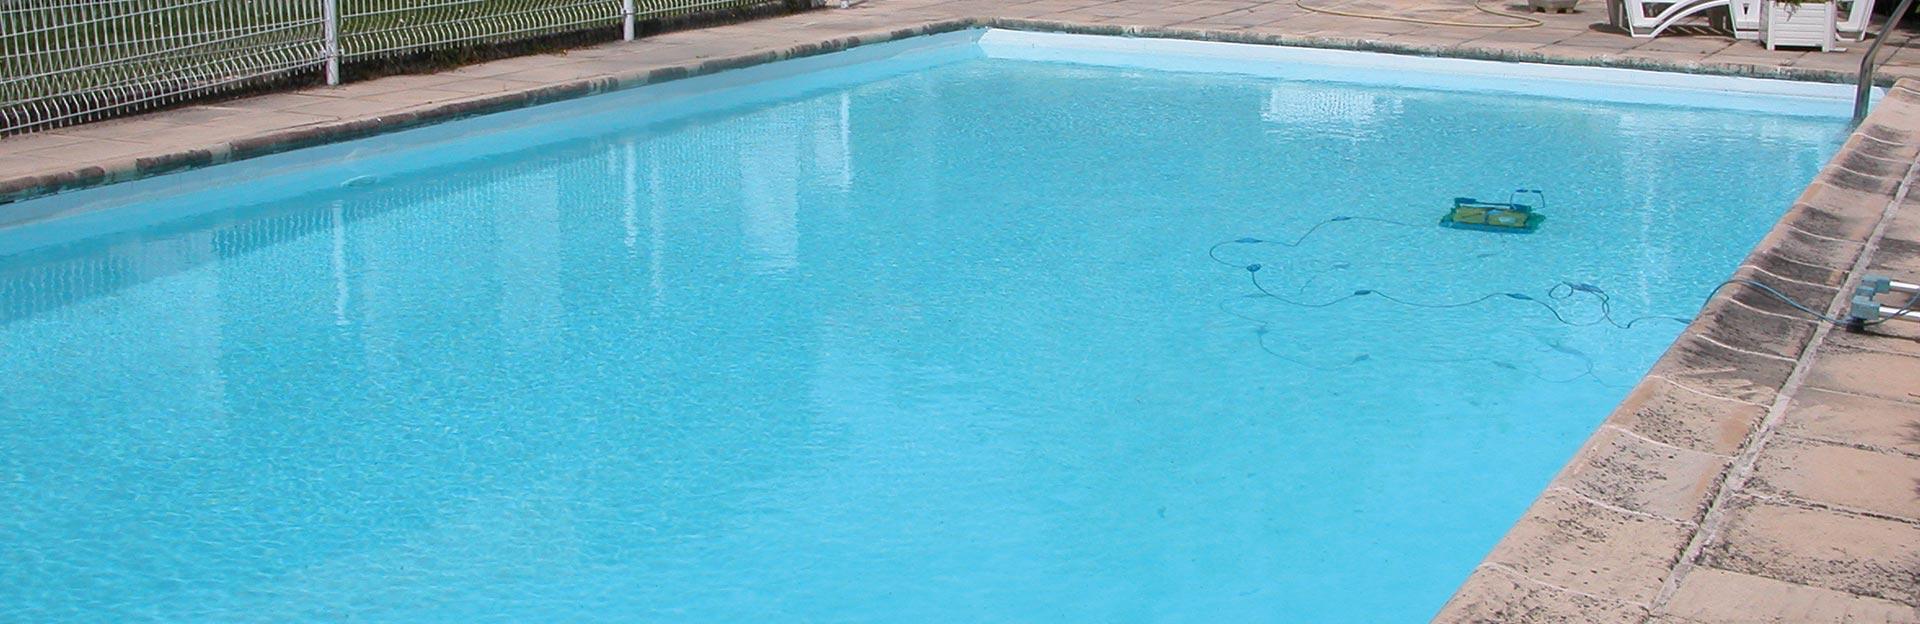 Pose de coques de piscines en polyester terrassement et for Pose piscine coque